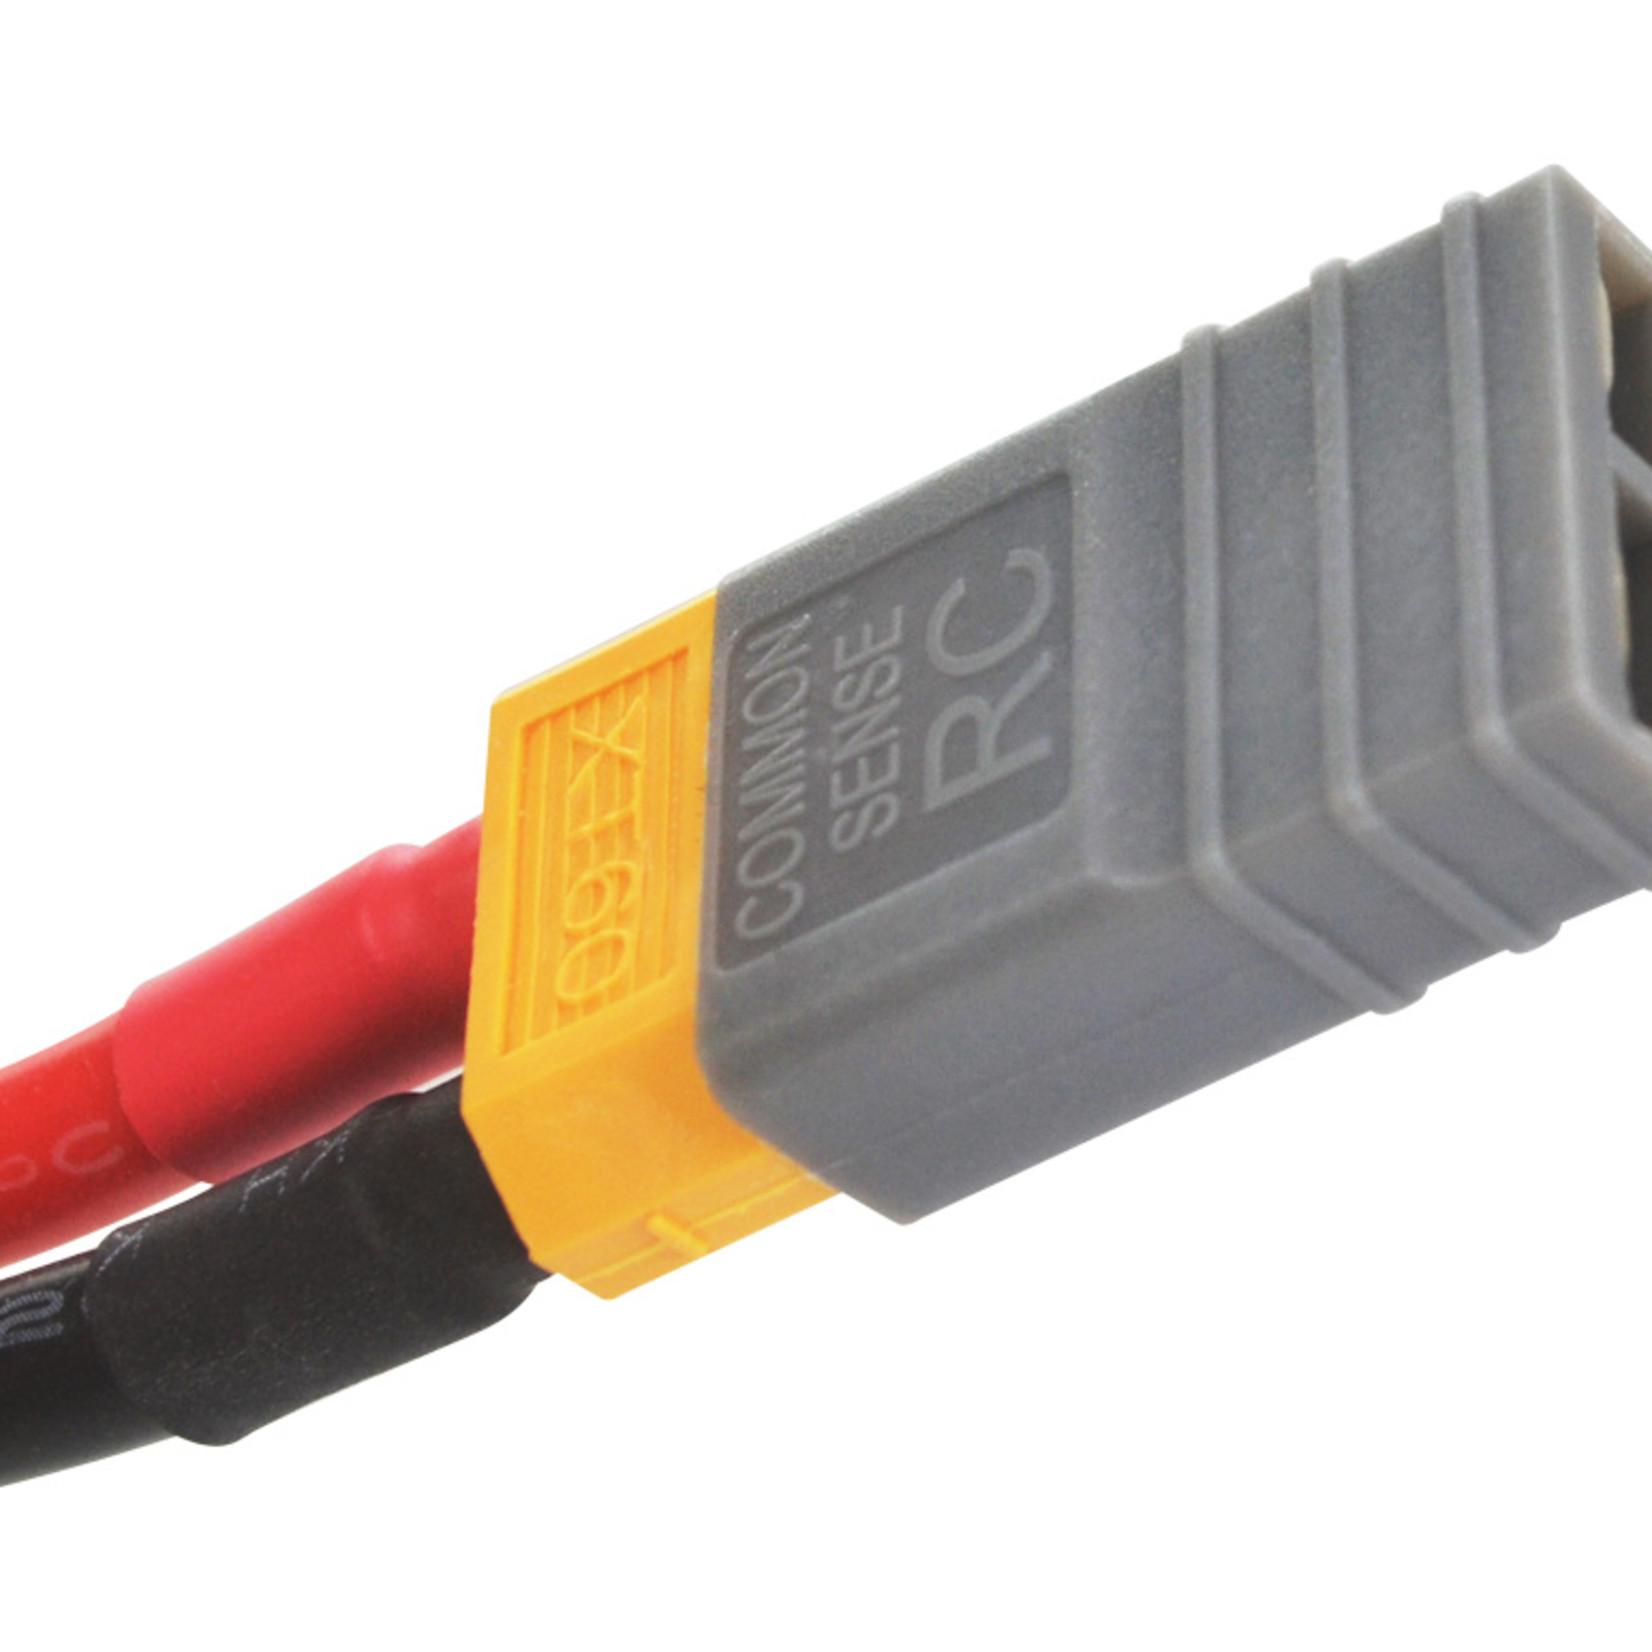 Lectron Pro CSRC2S5200-50X Lectron Pro 7.4V 5200mAh 50C Lipo Battery with XT60 Connector